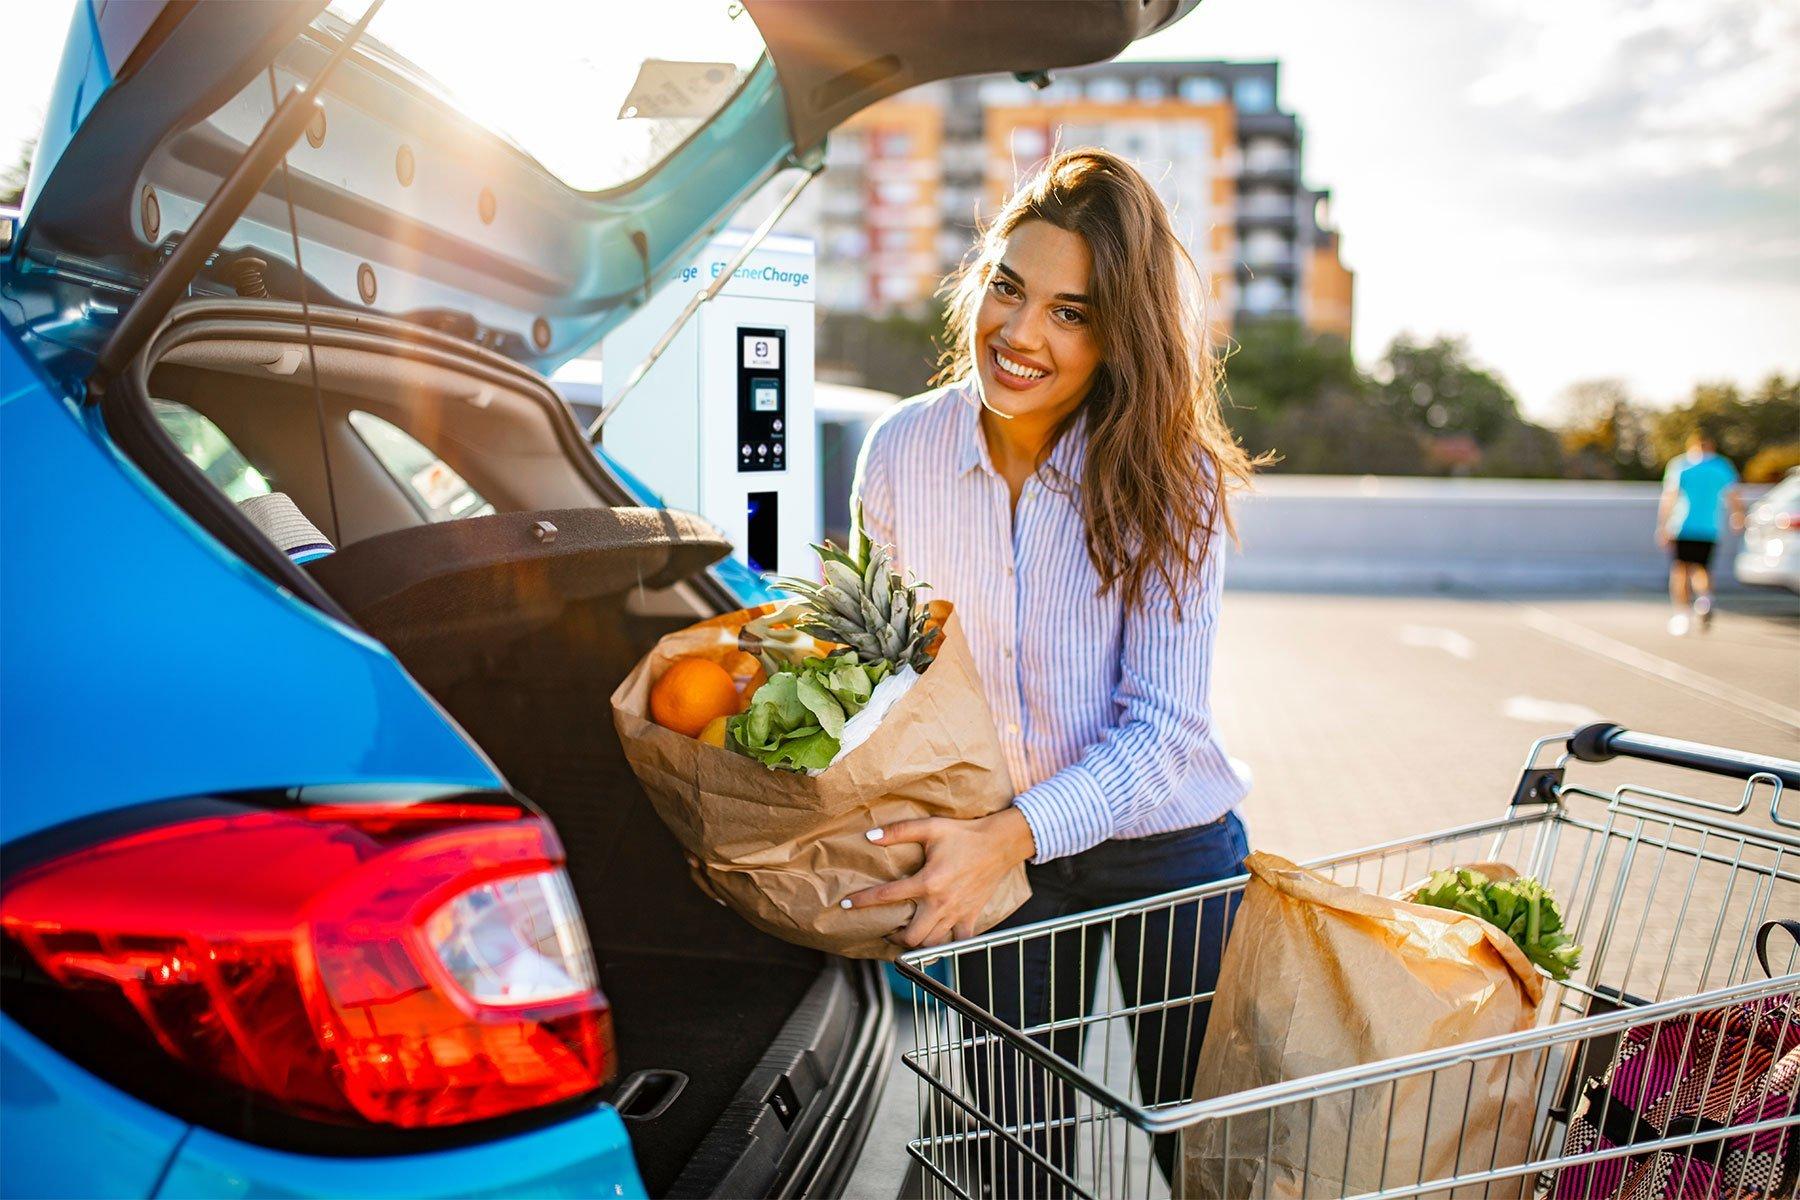 Frau beim Einkauf